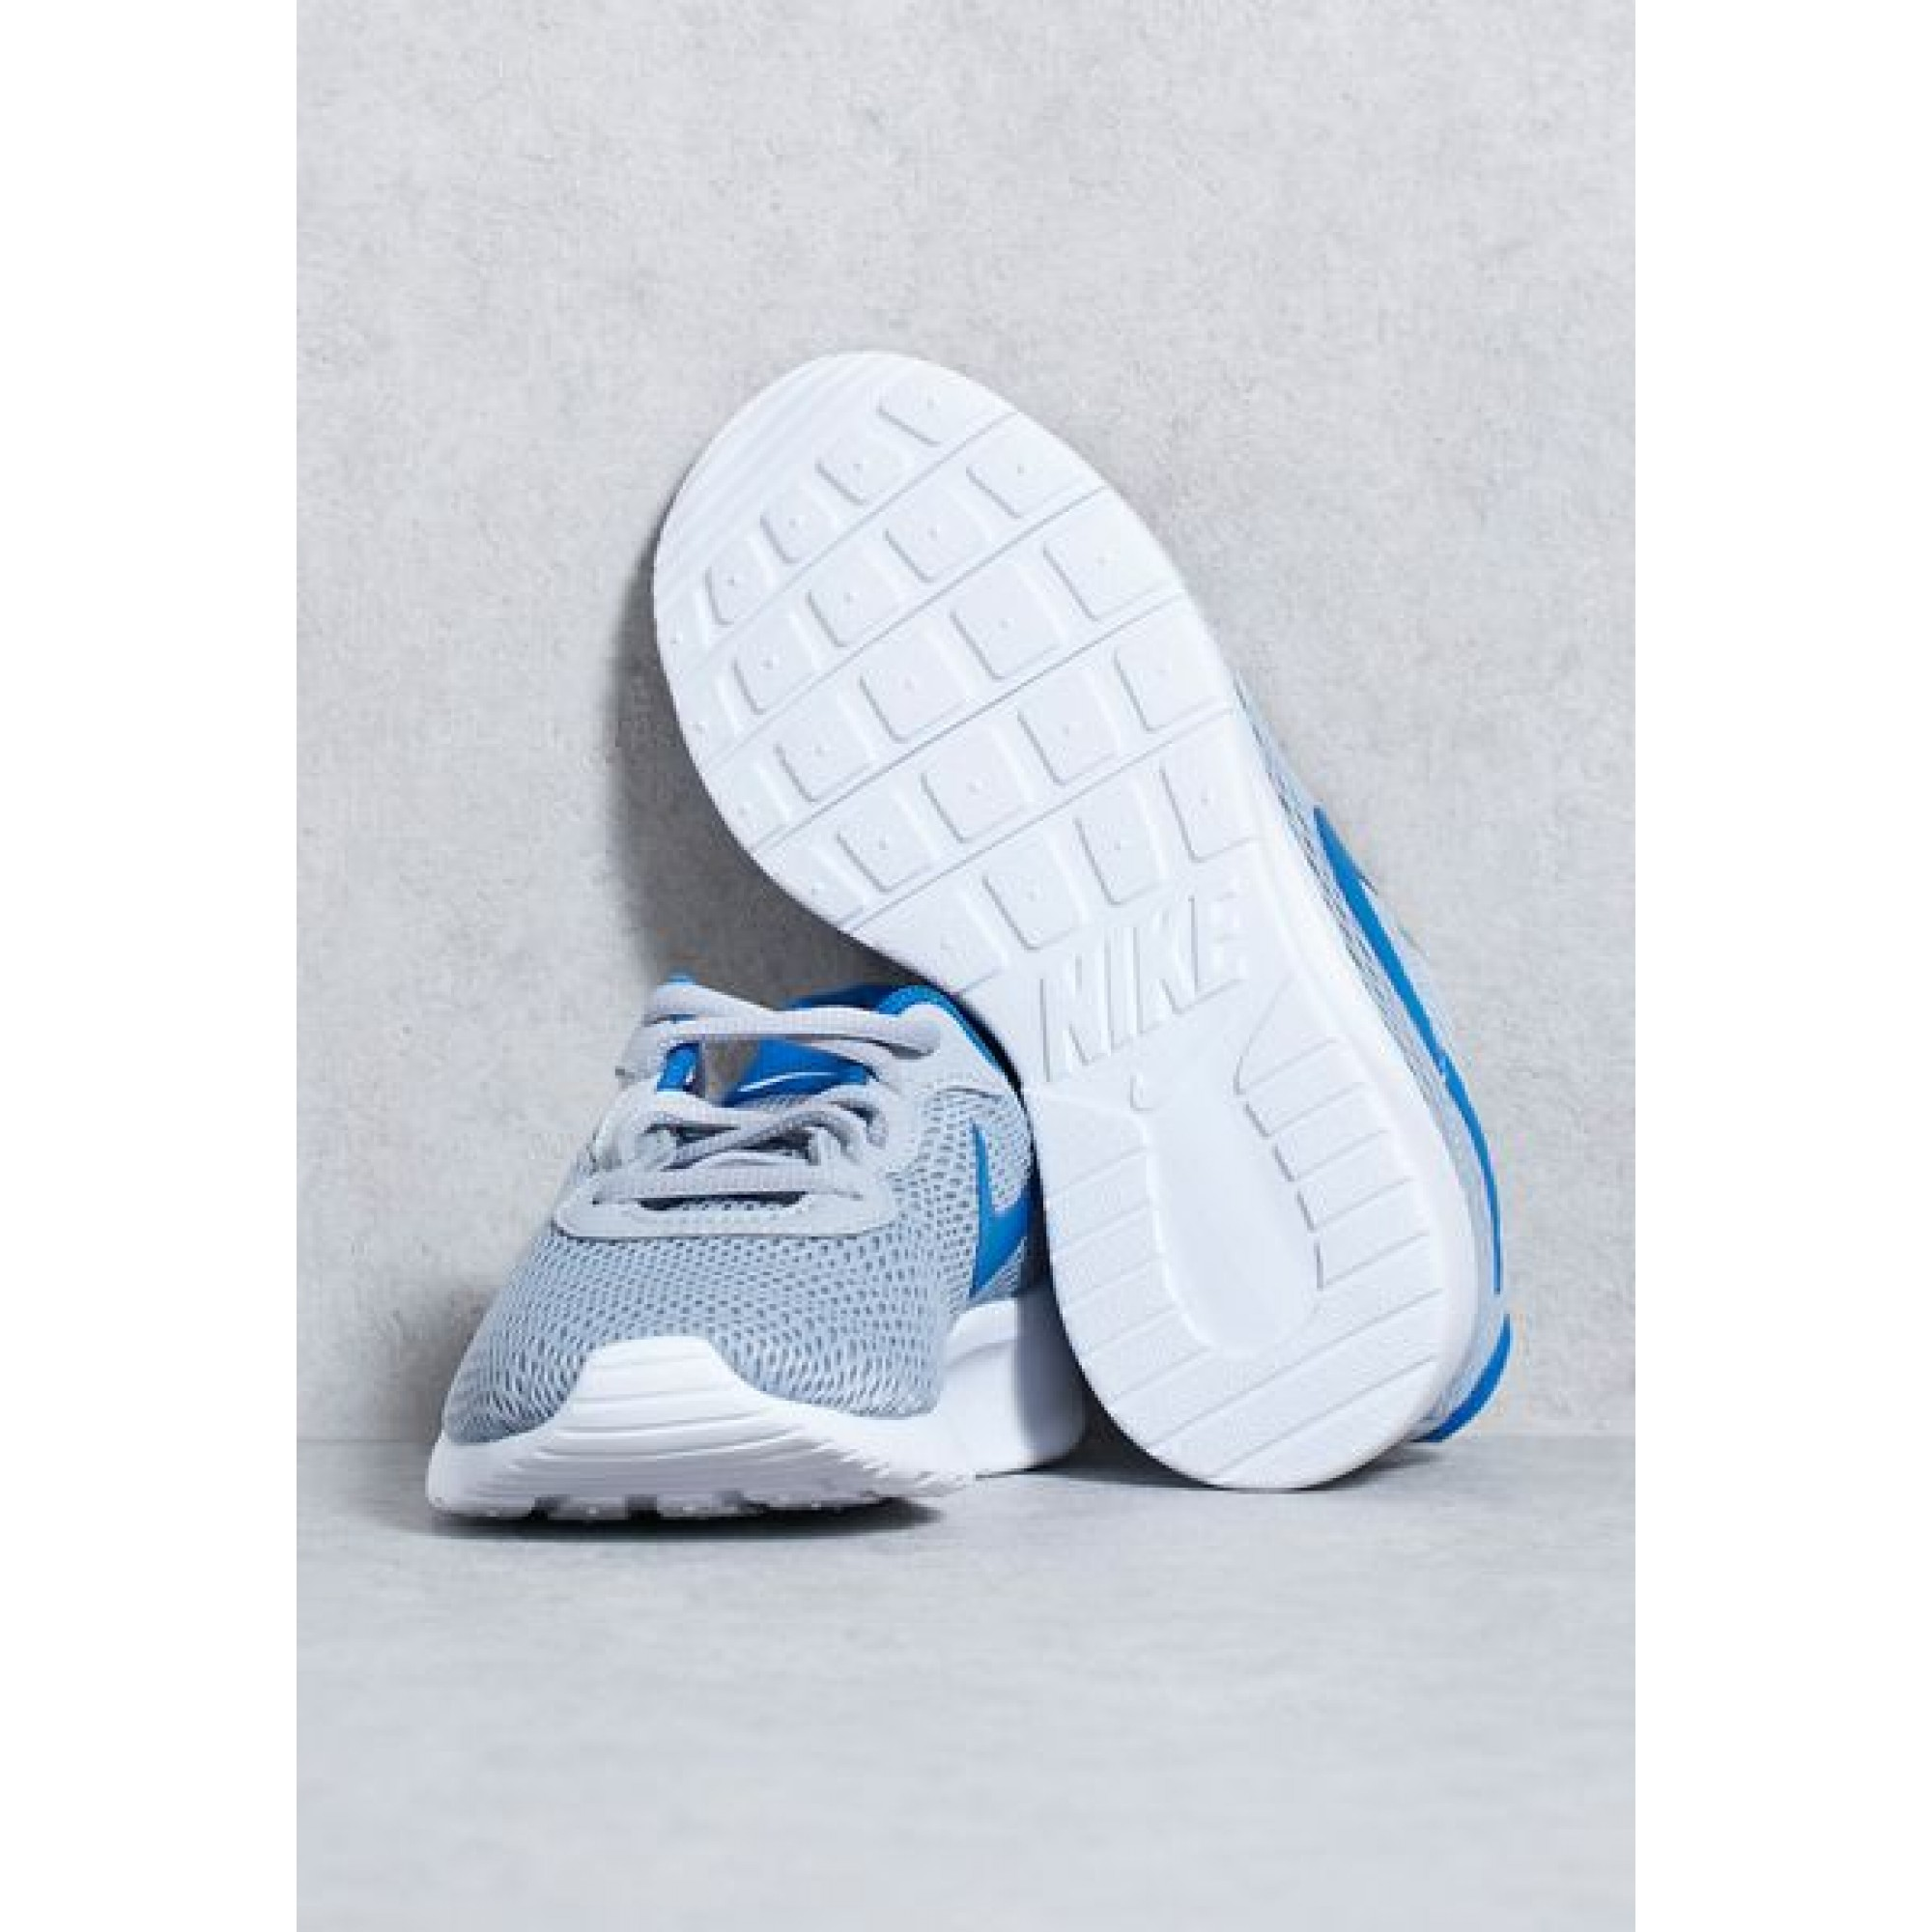 06fefe96459 Kids Nike Tanjun GS 818381-009 Παιδικό Γκρι